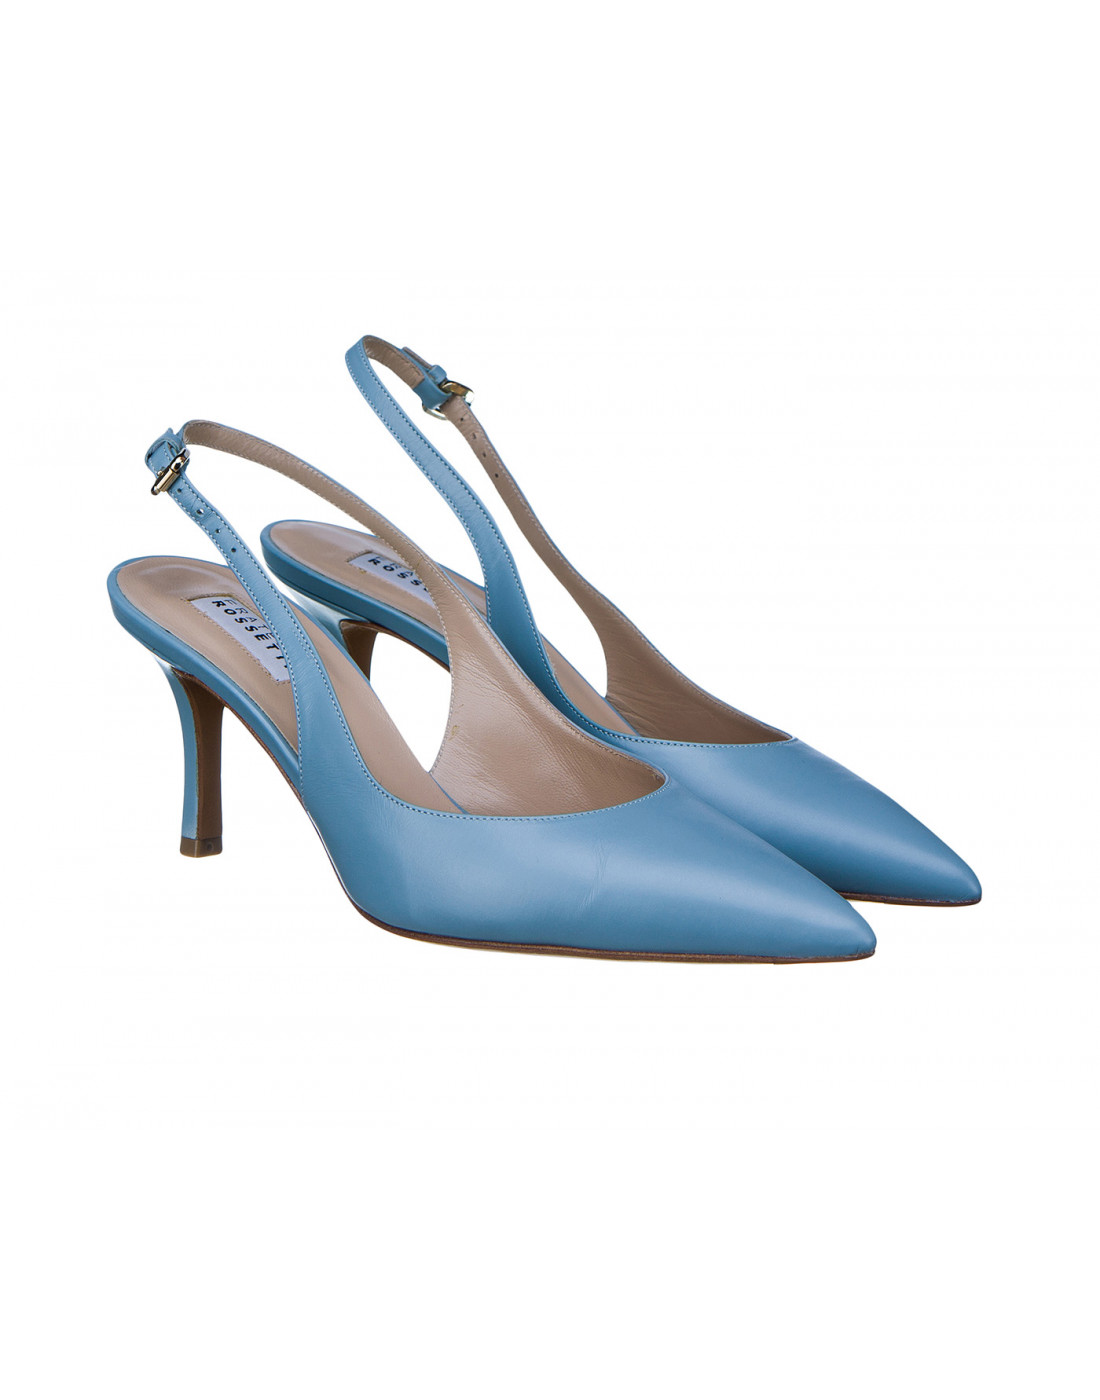 Босоножки голубые женские Fratelli Rossetti S66267-2